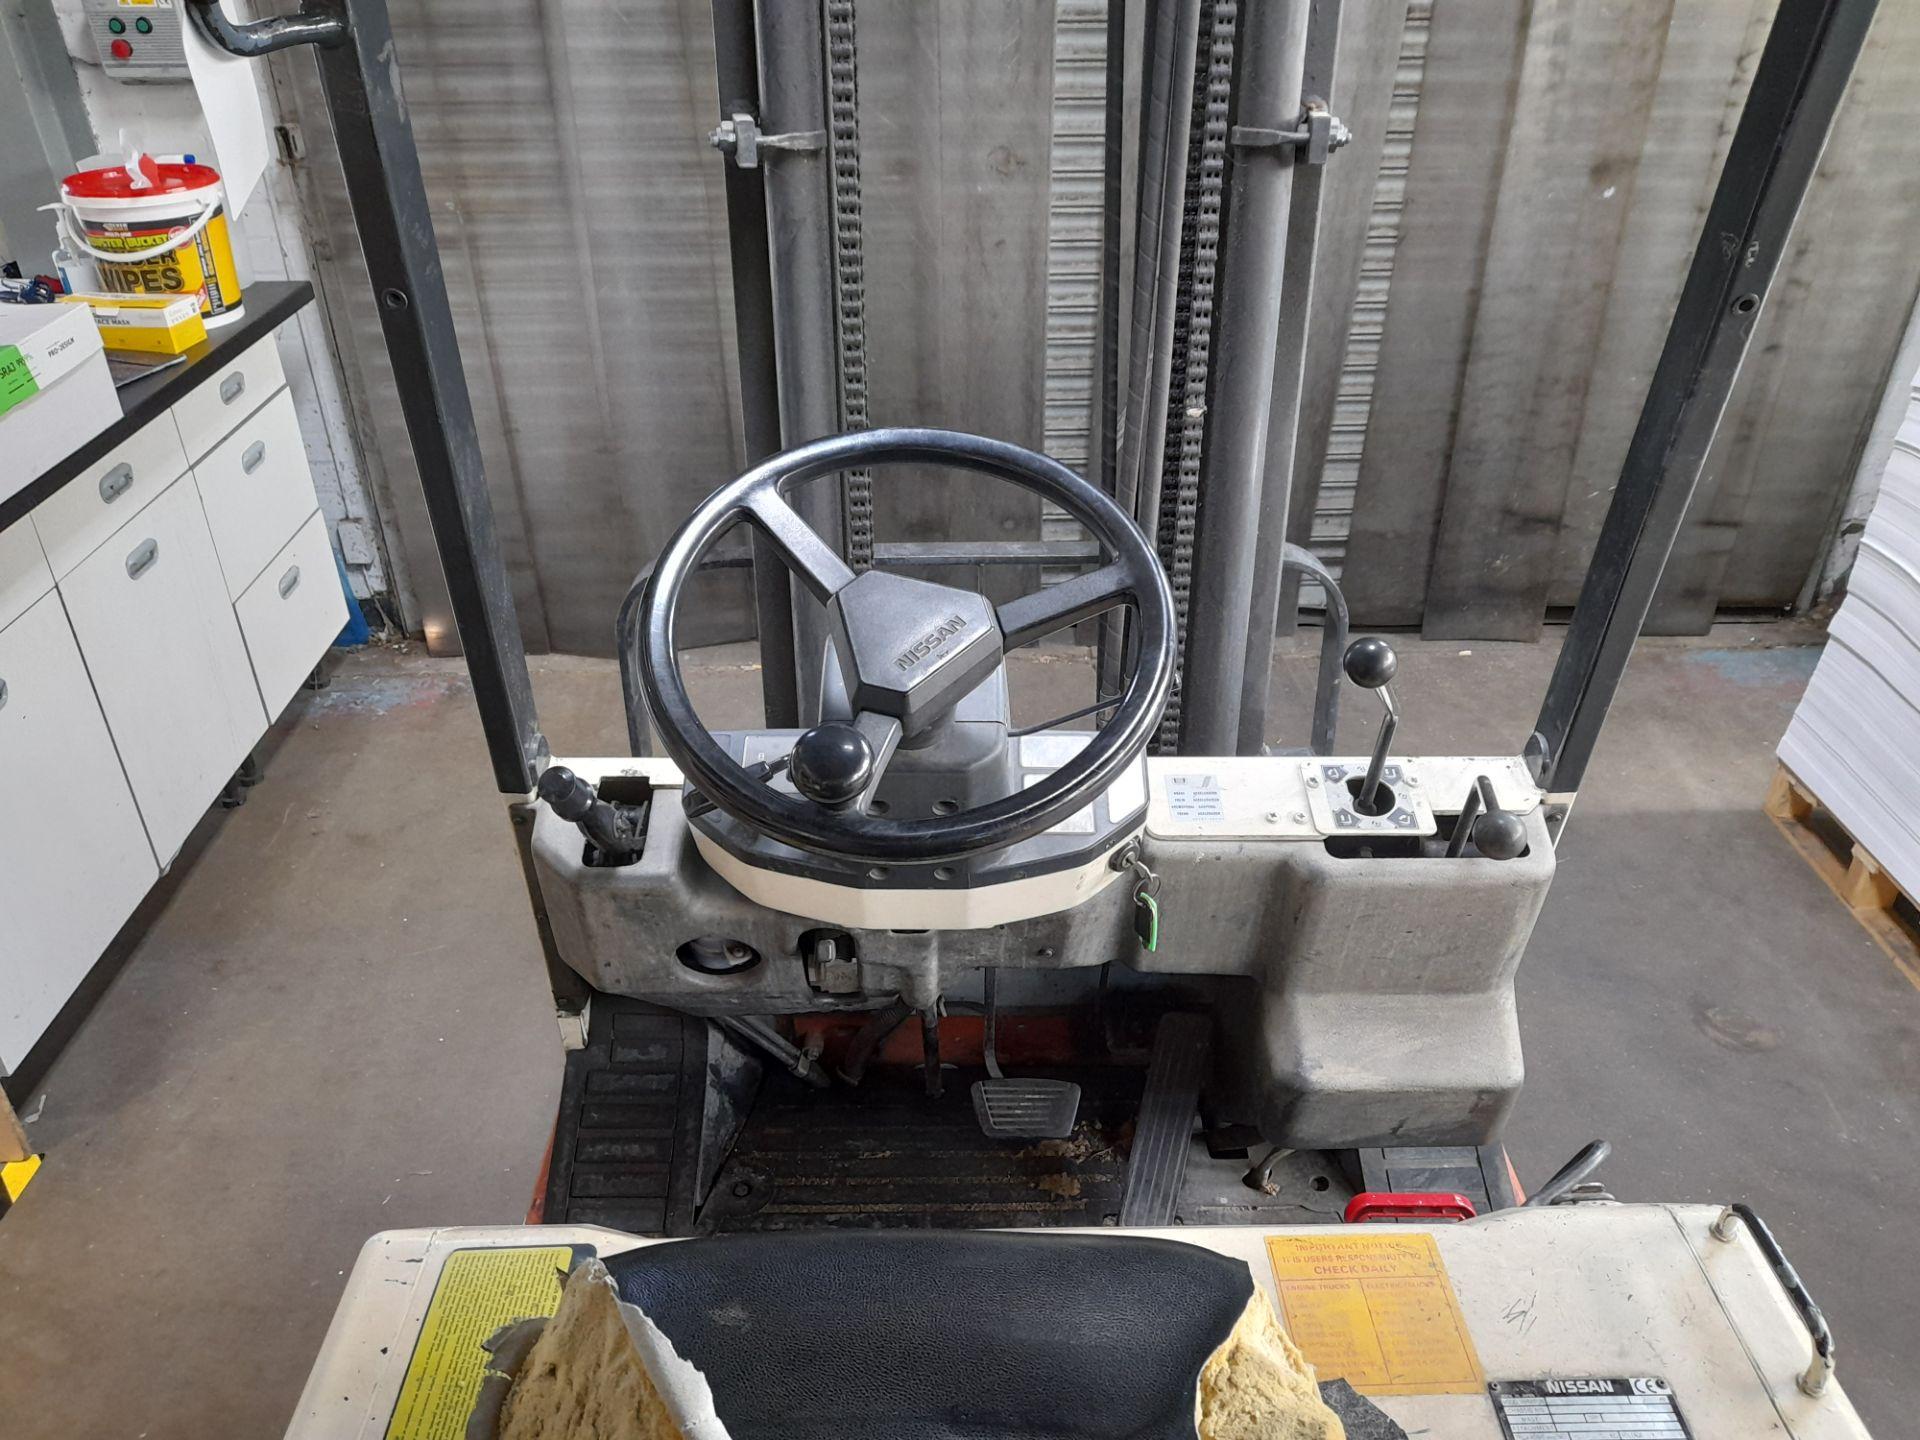 Nissan N01438-U electric 3 wheel forklift truck, C - Image 2 of 5